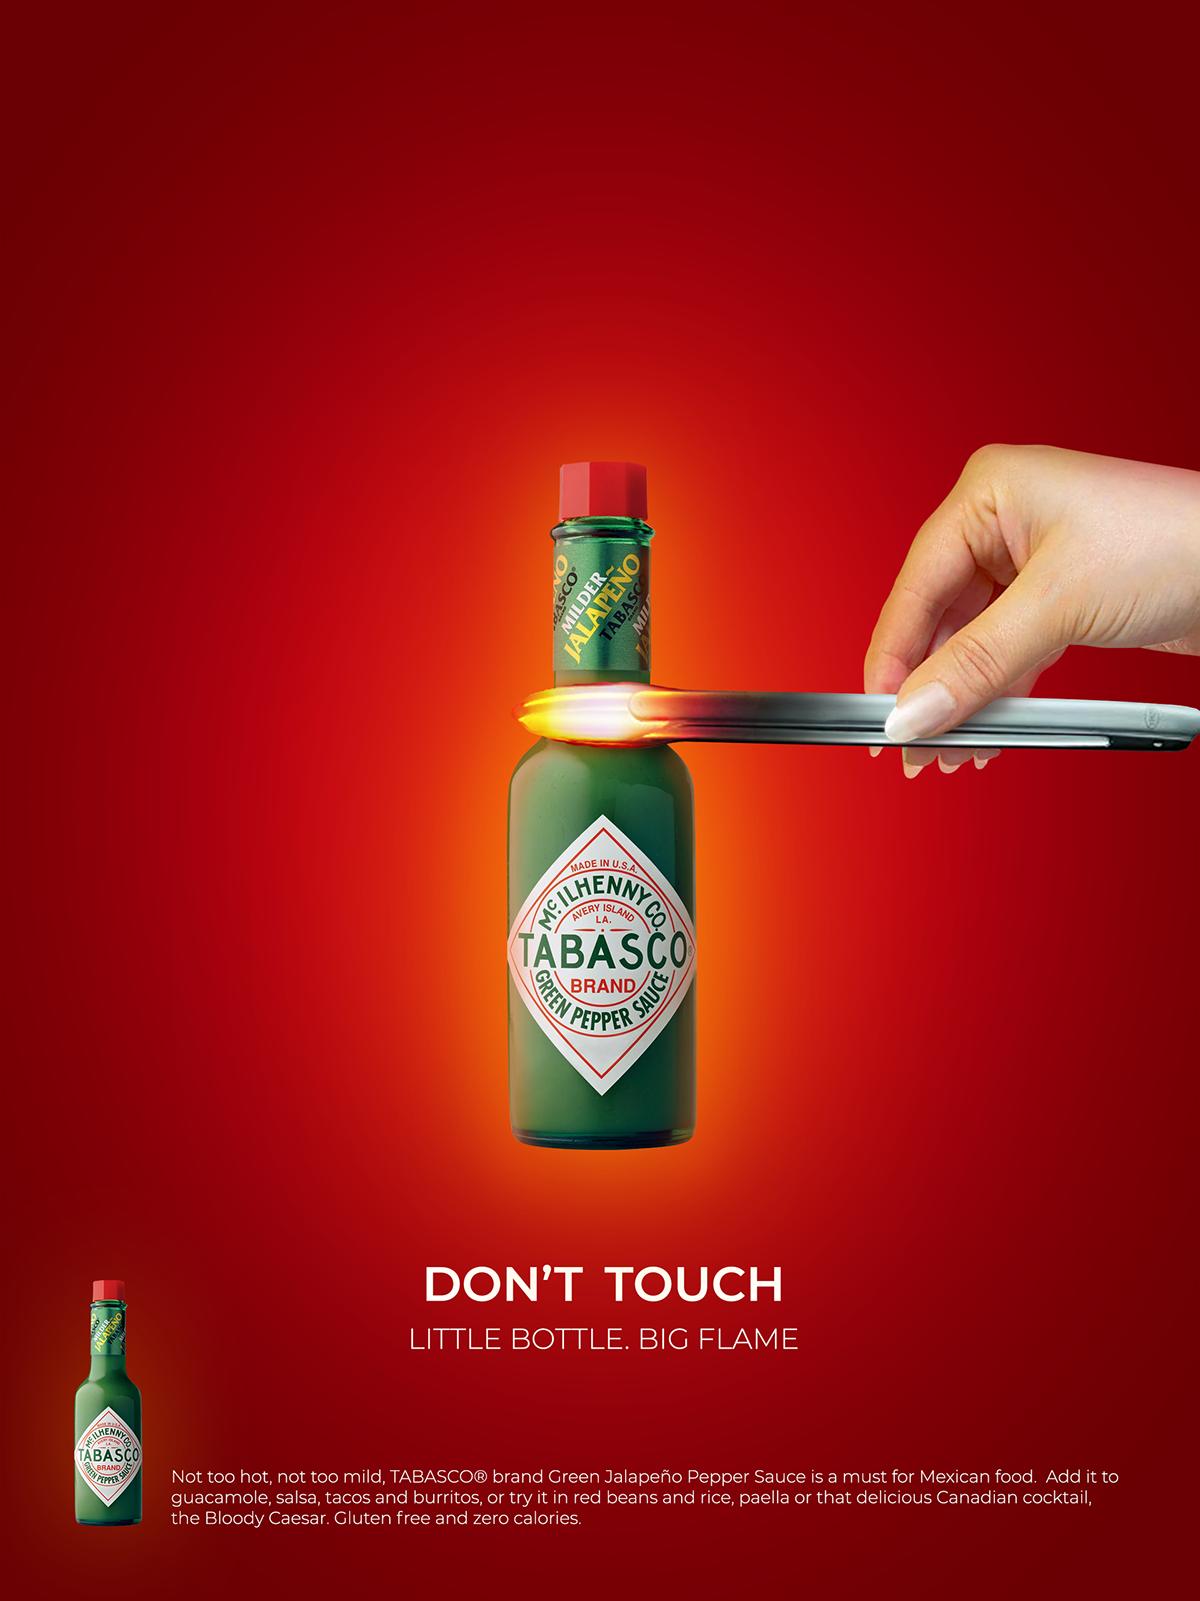 Tabasco Print Ads On Behance Ads Creative Graphic Design Ads Creative Advertising Design